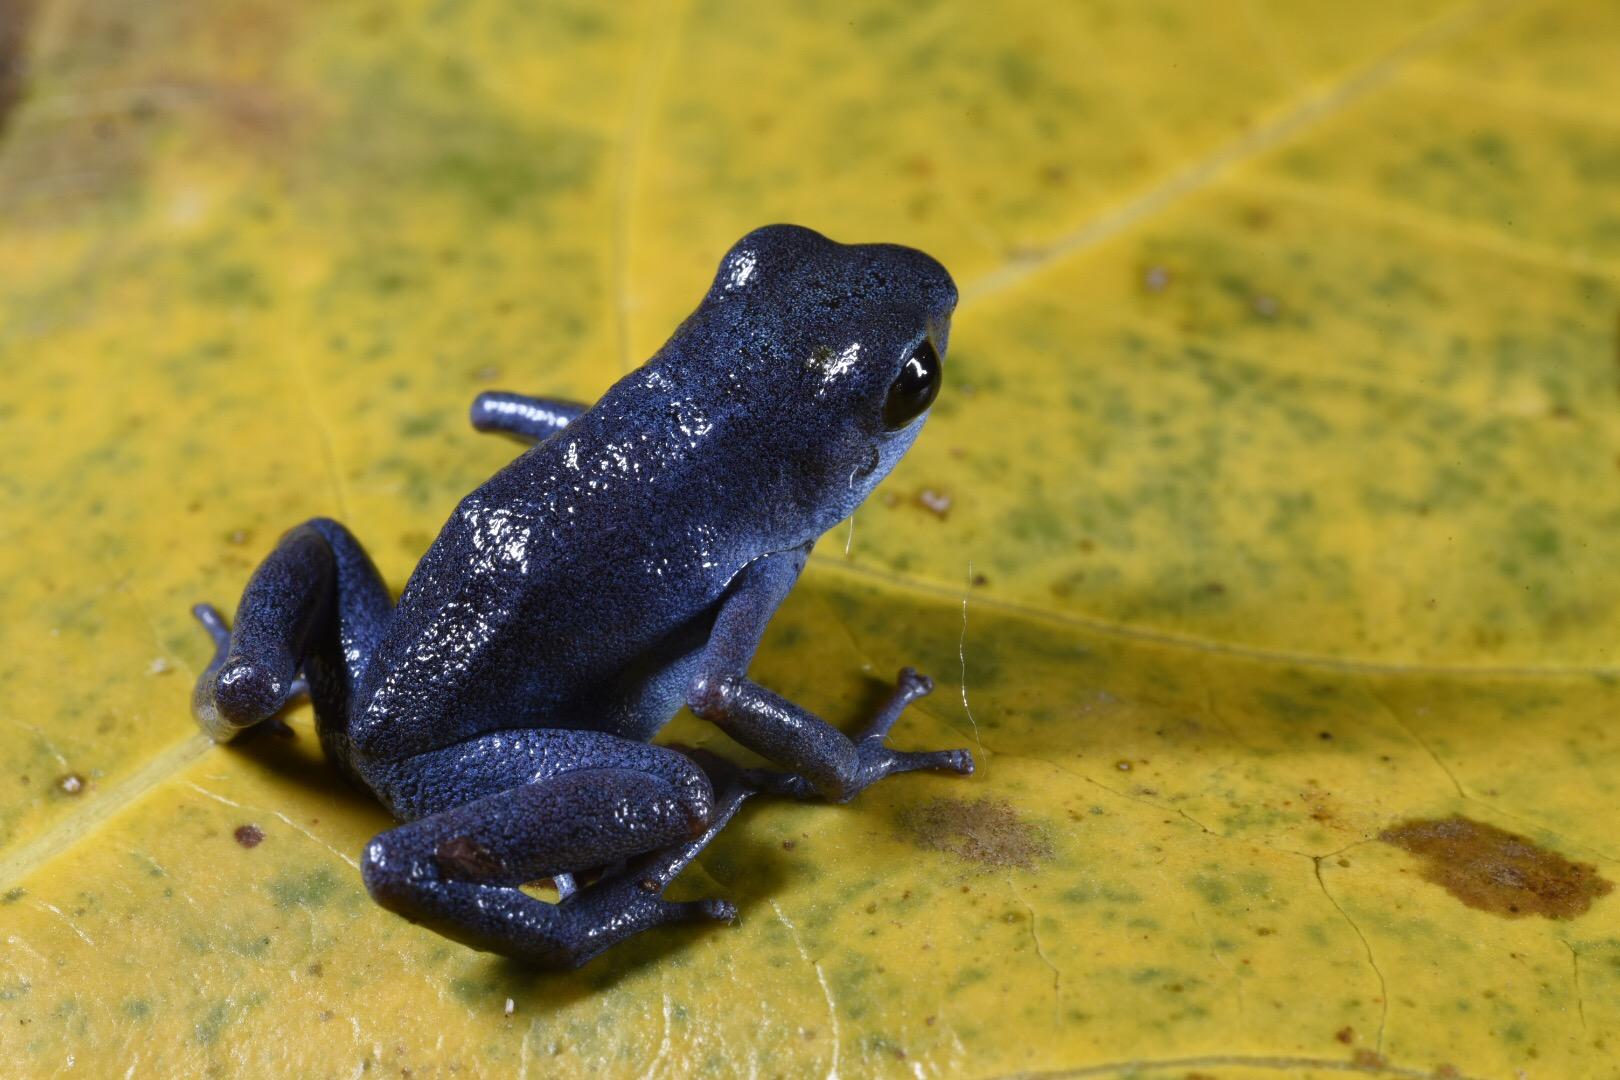 Oophaga pumilio , all blue morph, Bocas del Toro Panamá (Image: F. Muller).